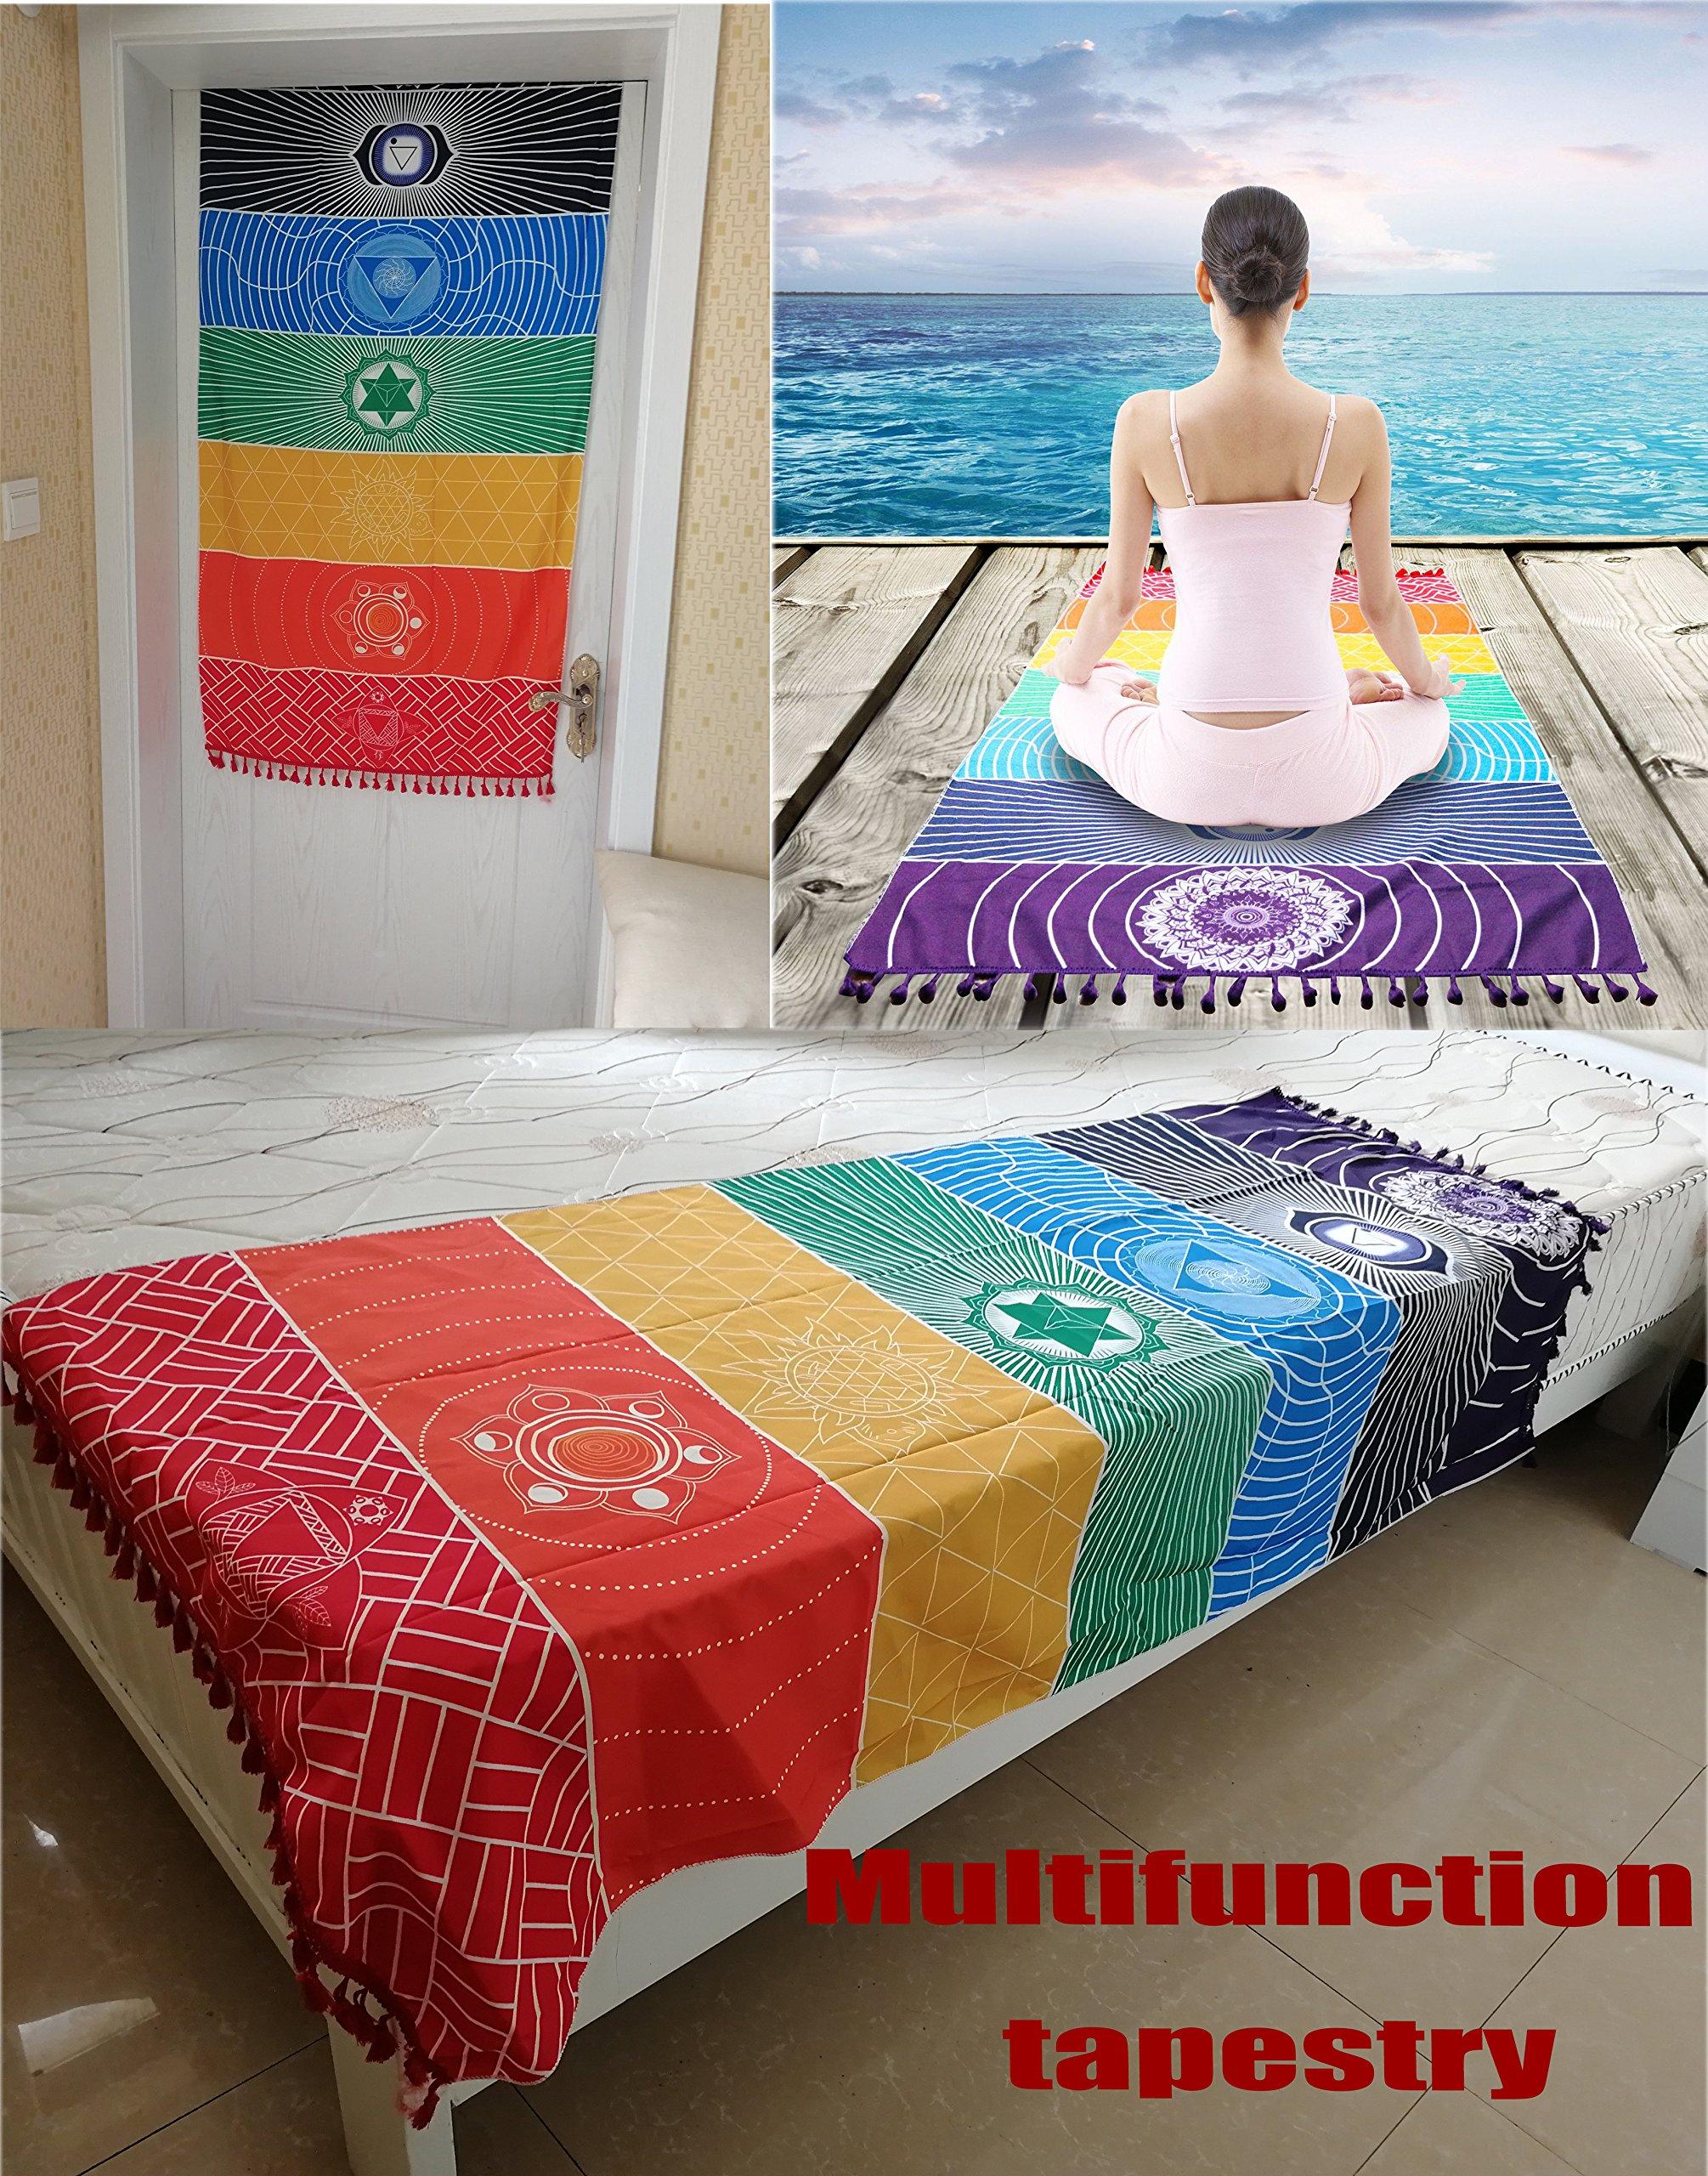 Neasyth 7 Chakra Tapestry, Meditation Mexico Chakras Tassel Yoga Rug Striped Shawl Towel Beach Towels Mat 59 in